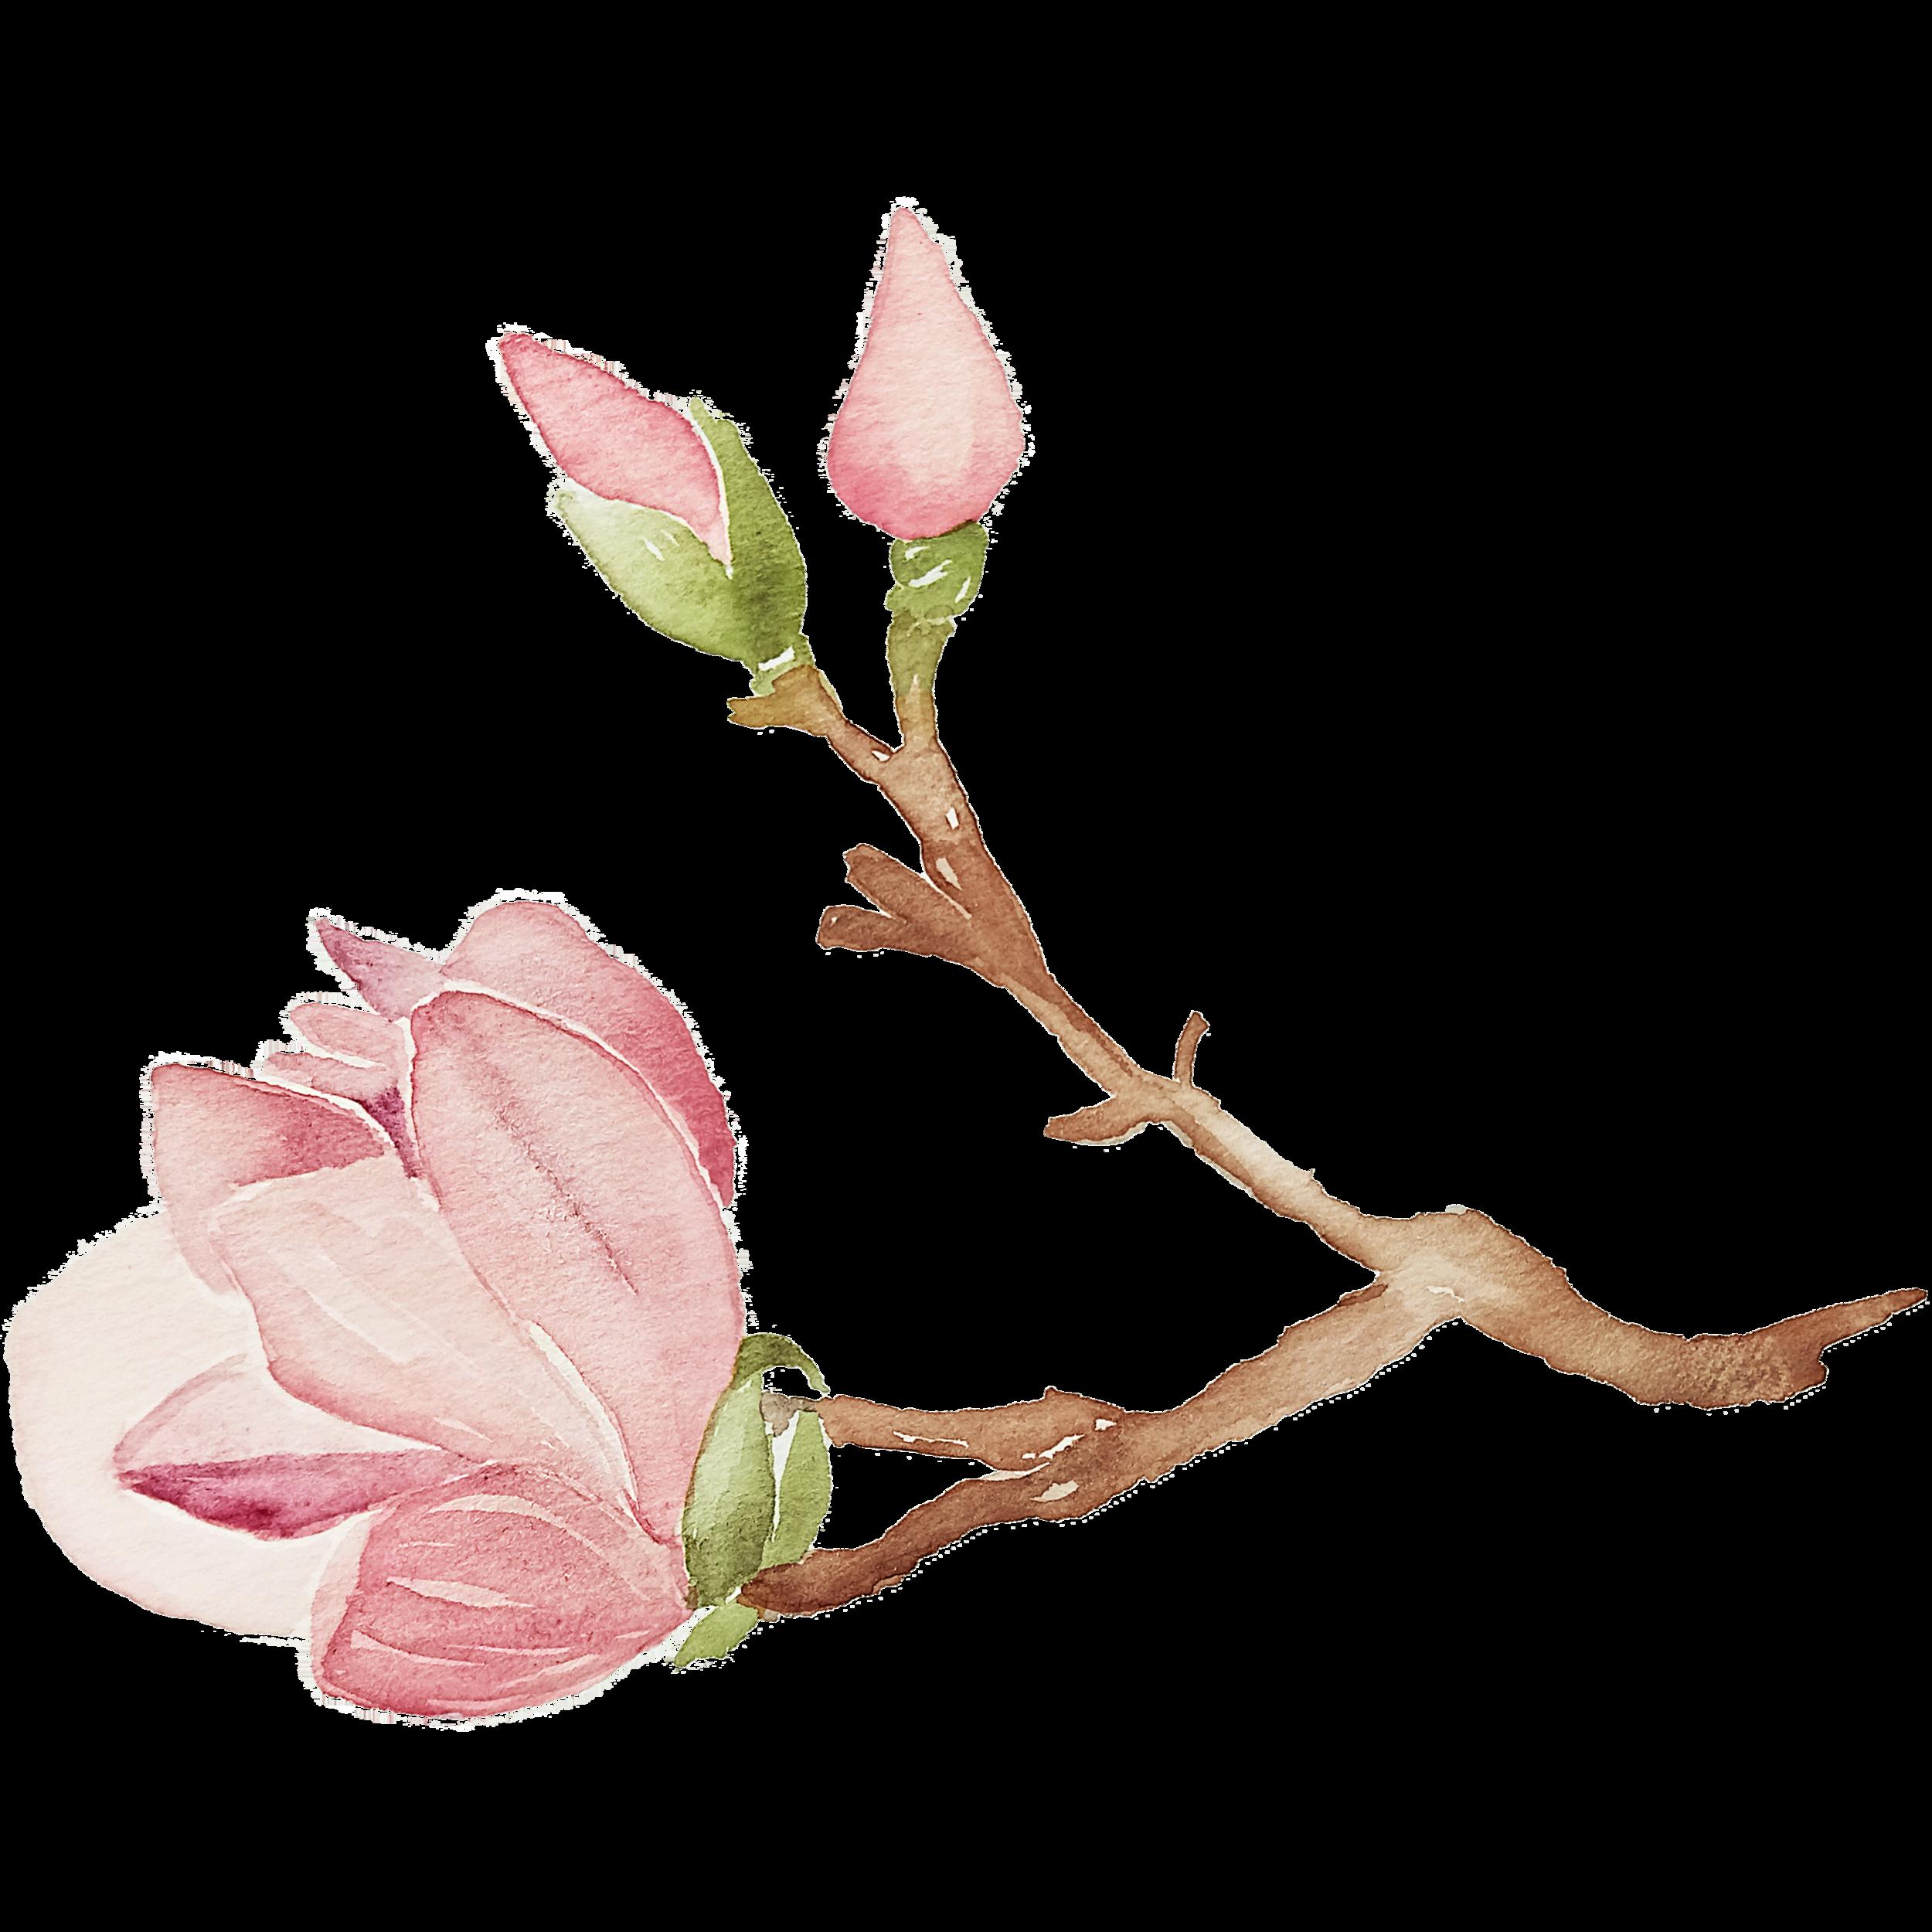 IanMikraz-Watercolor-Magnolia-Flower-Illustration-Graphics-08.png